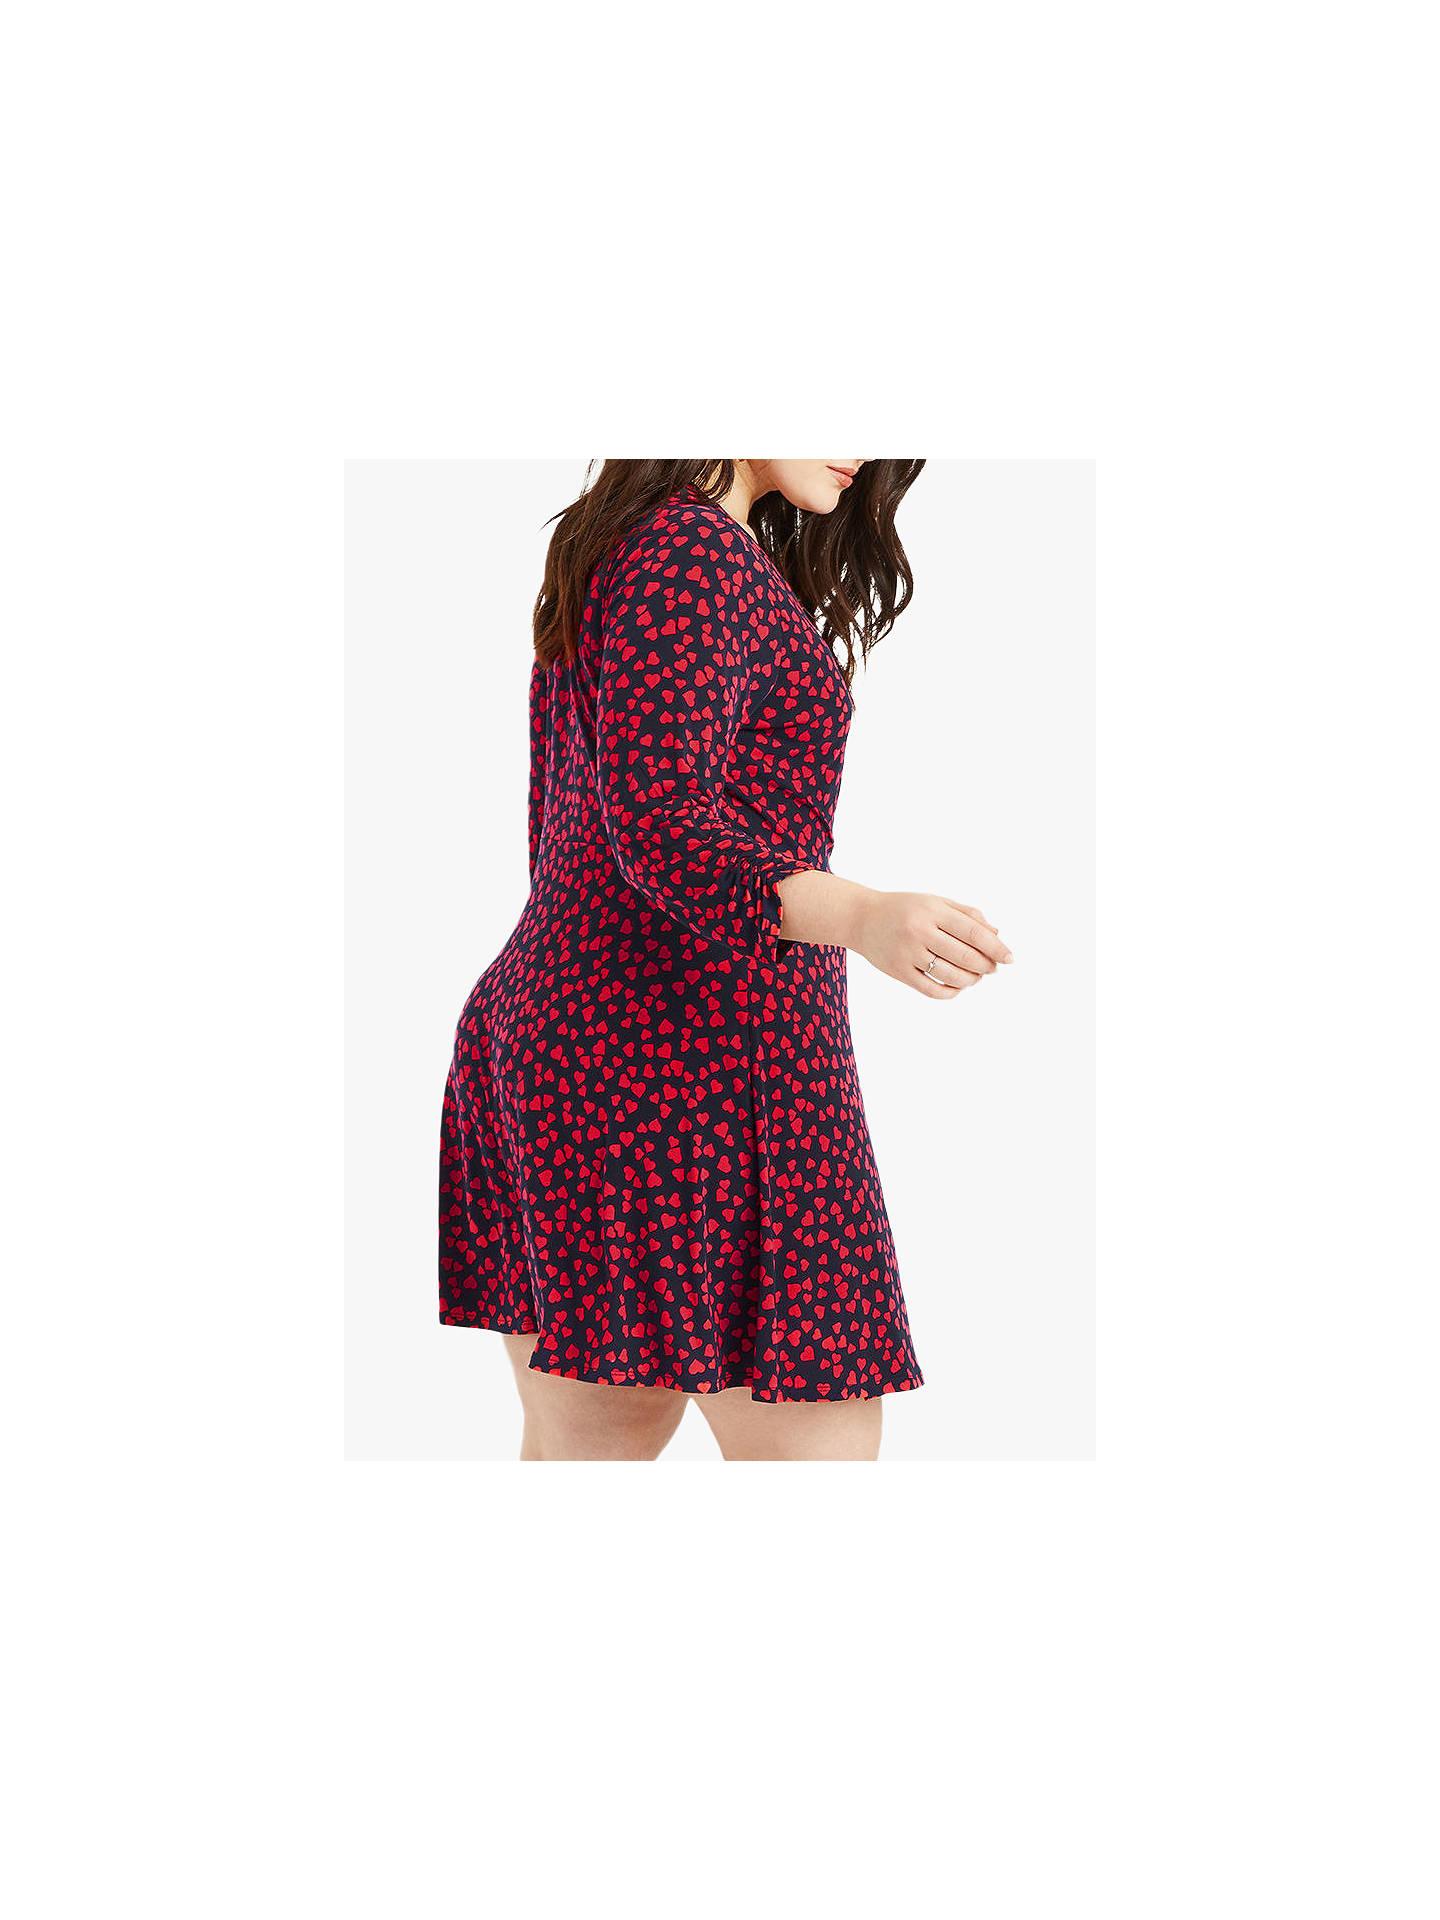 81244dd05286 ... Buy Oasis Curve Heart Print Twist Dress, Multi/Blue, XL Online at  johnlewis ...